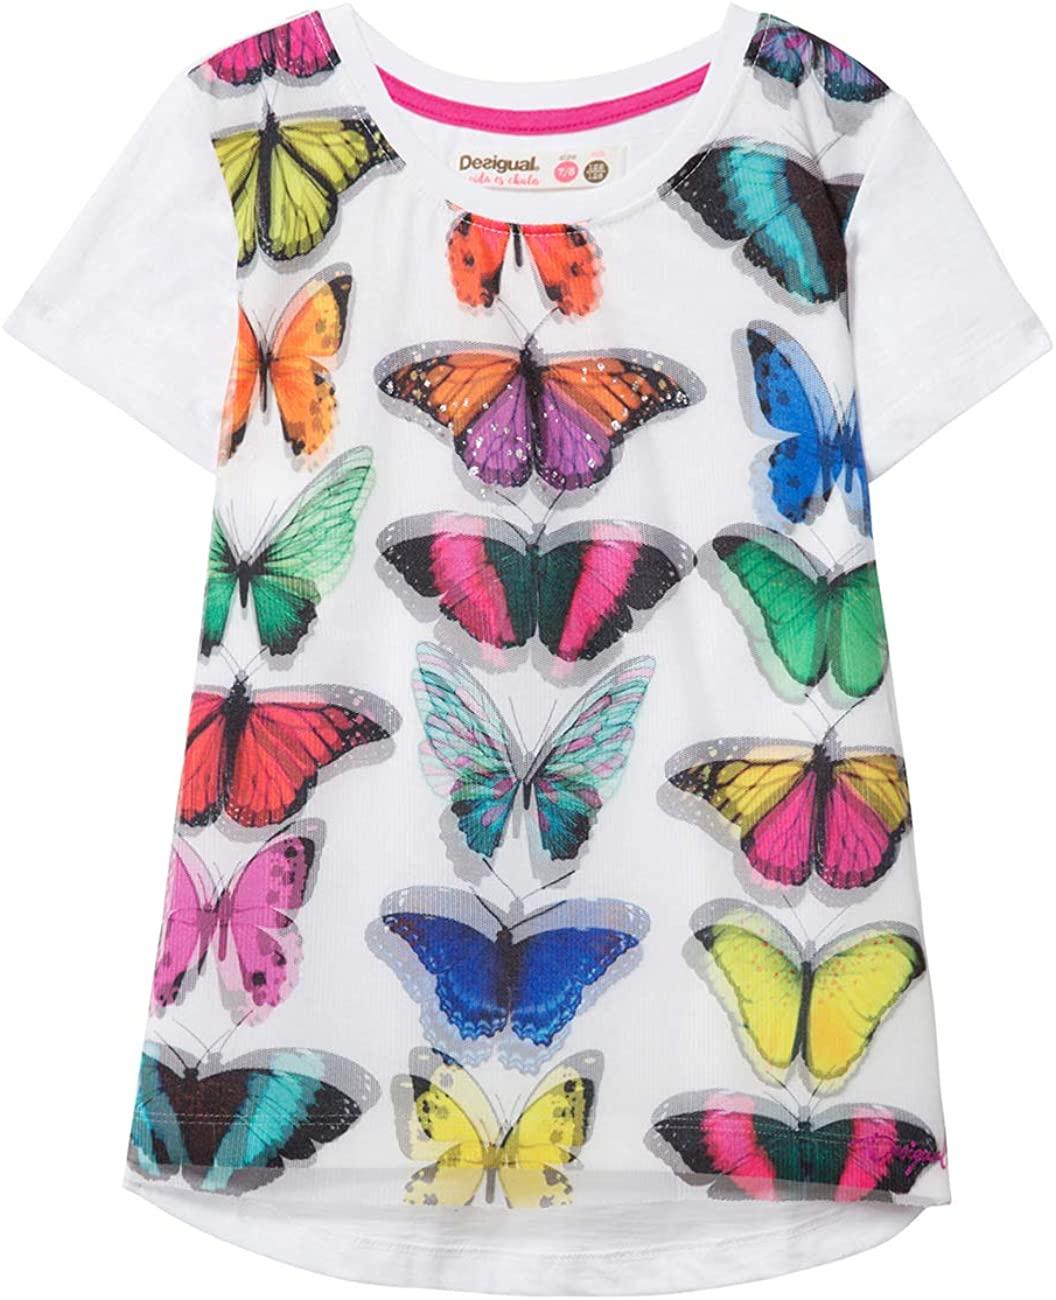 Bambina TS/_Halifax Desigual Girl Knit T-Shirt Short Sleeve